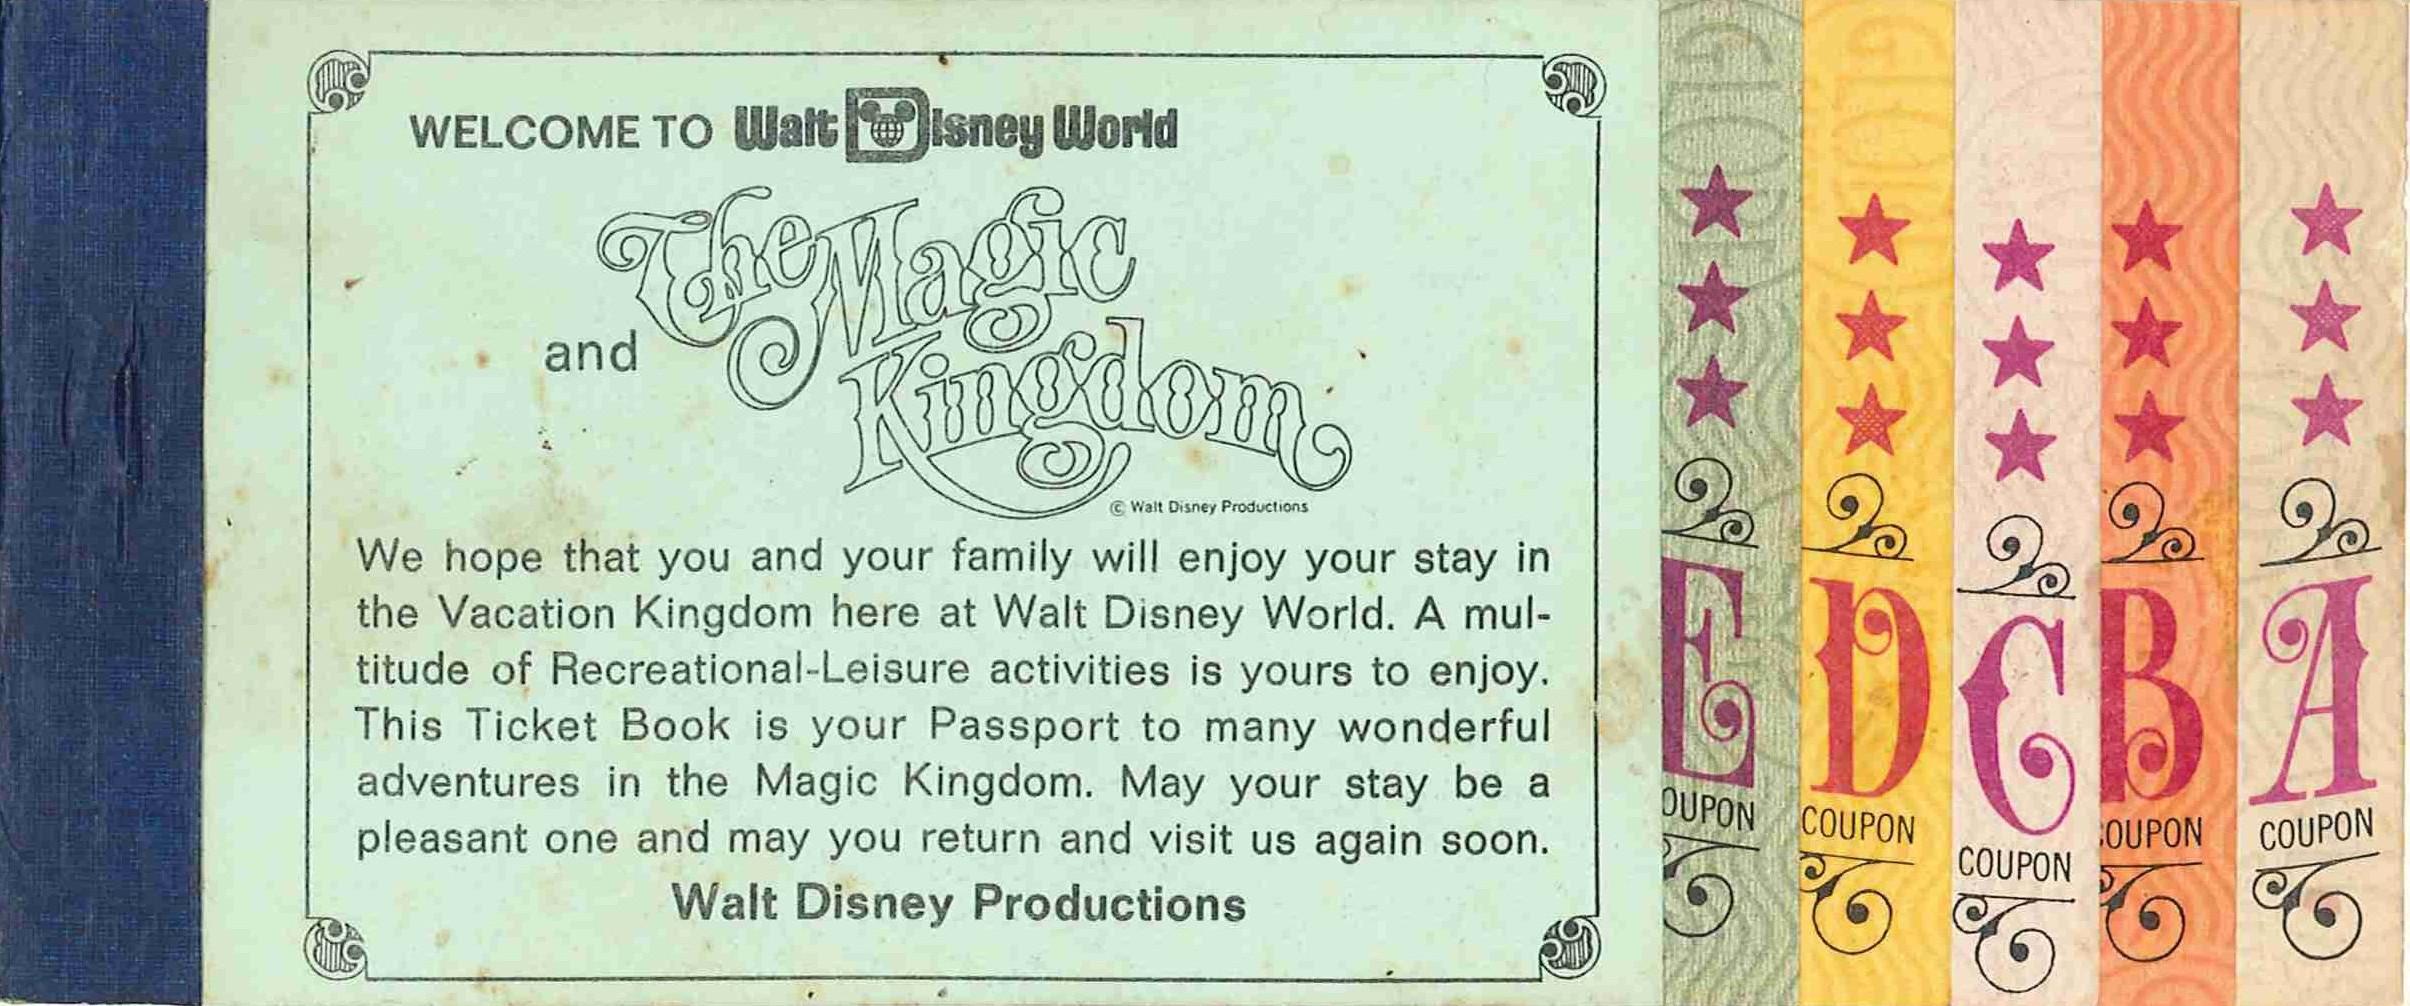 A vintage ticket bookfor Walt Disney World.